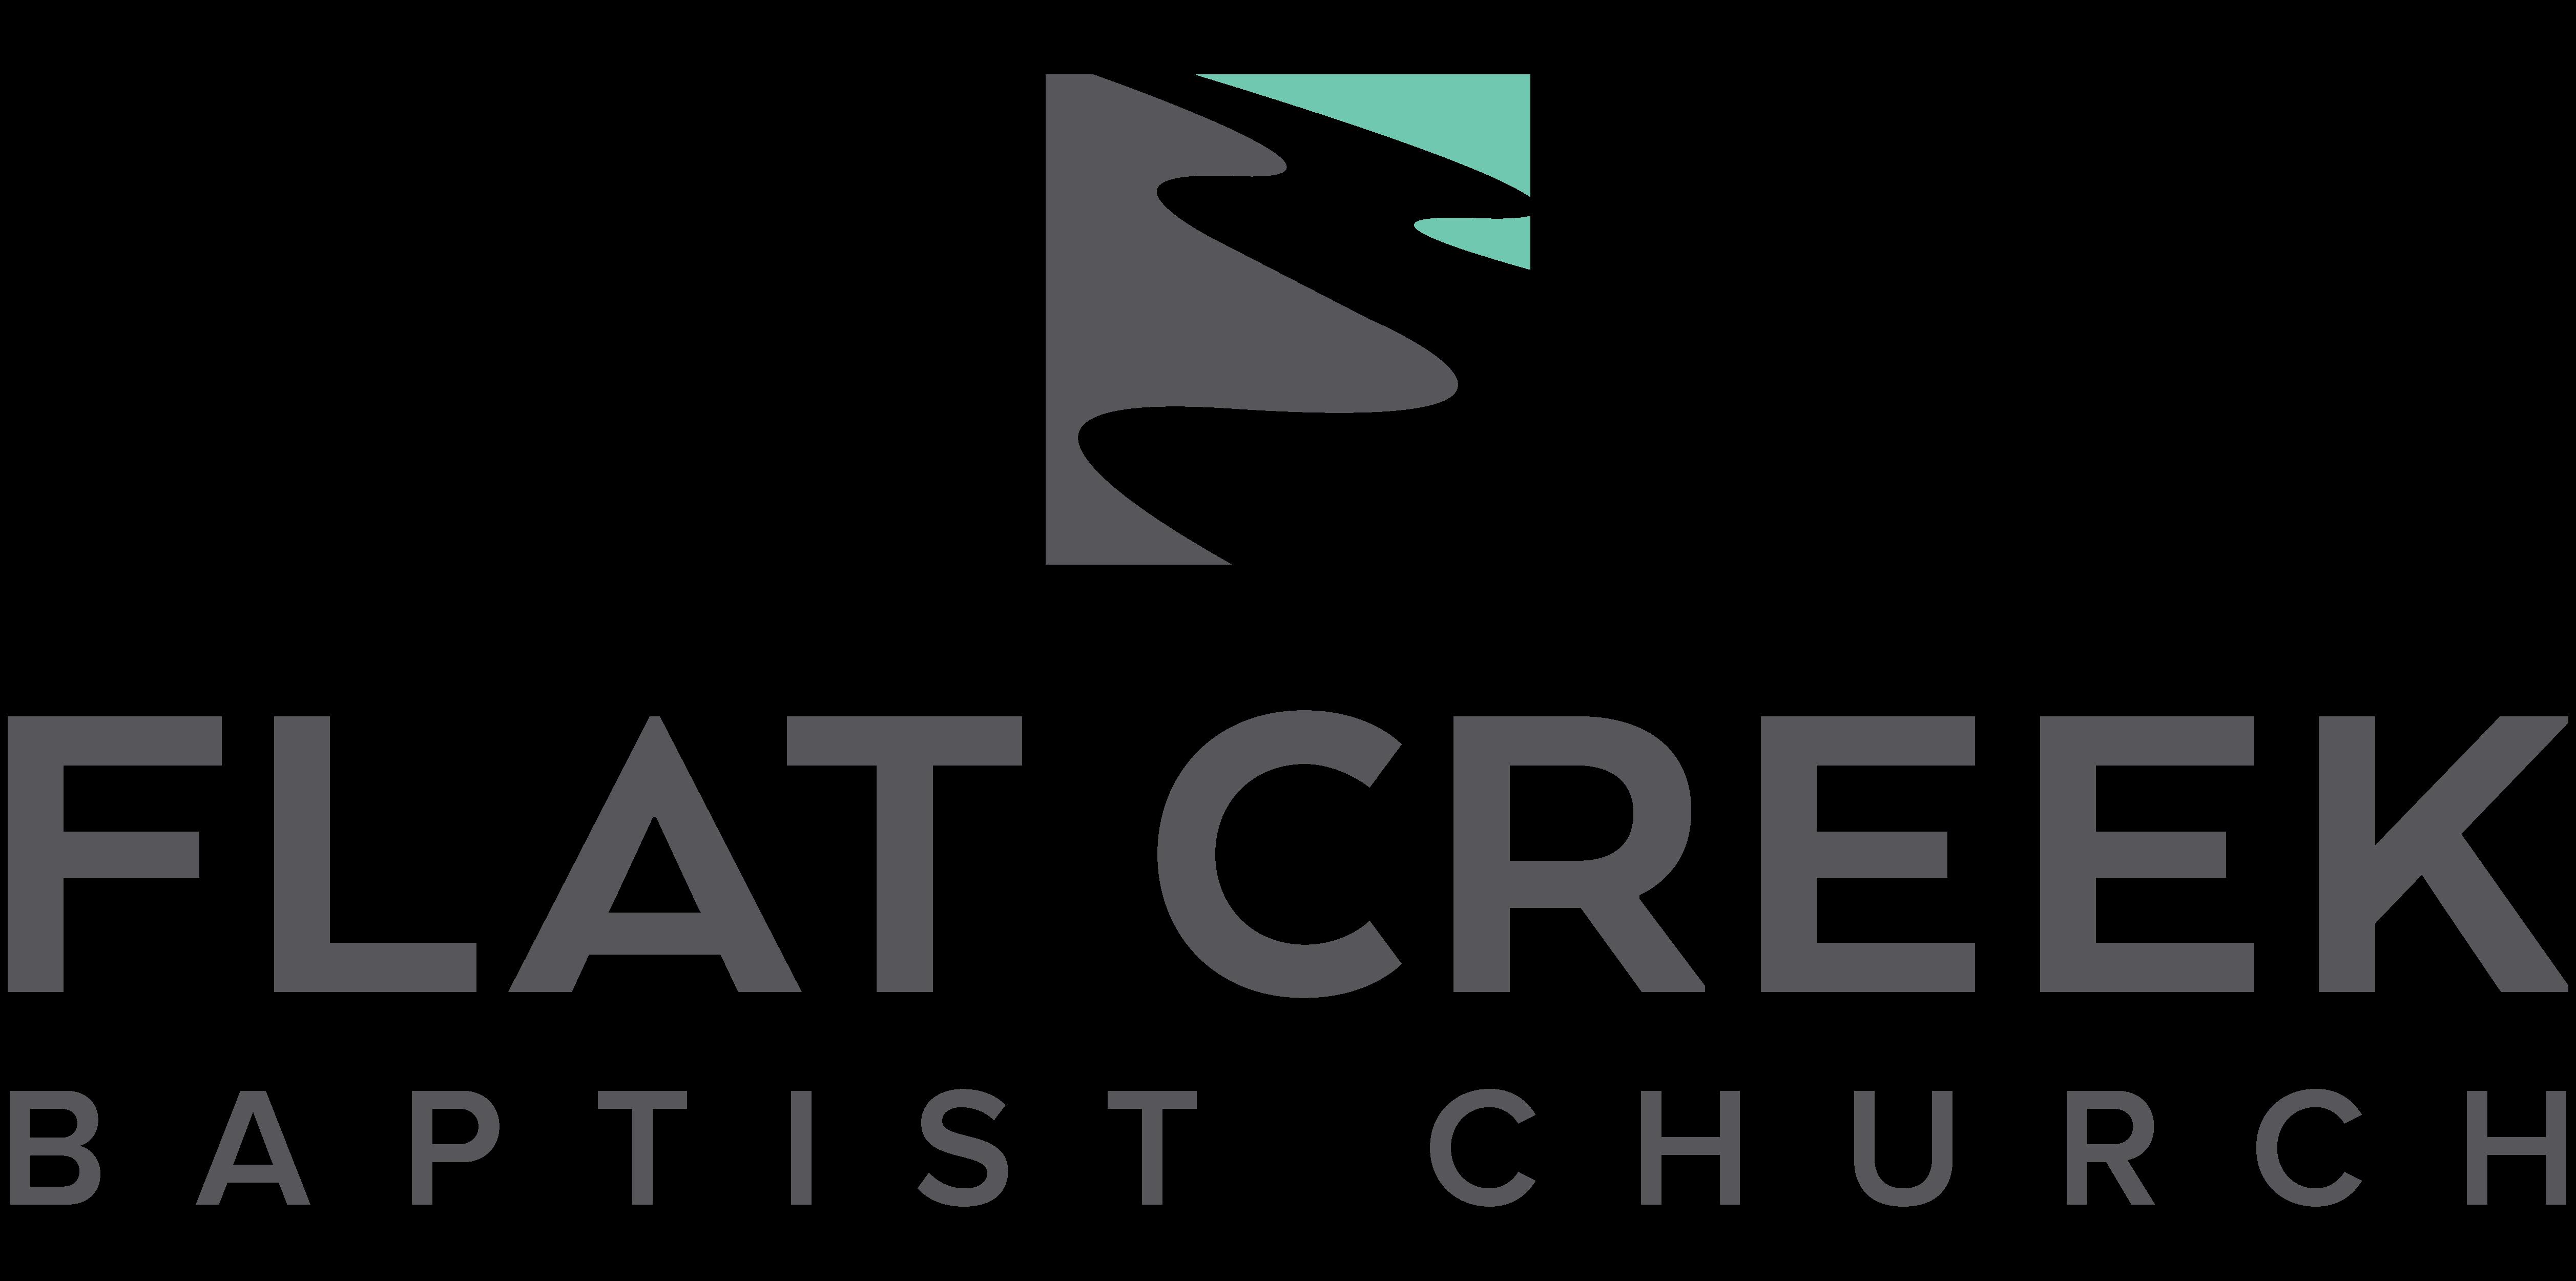 Flat Creek Baptist Church